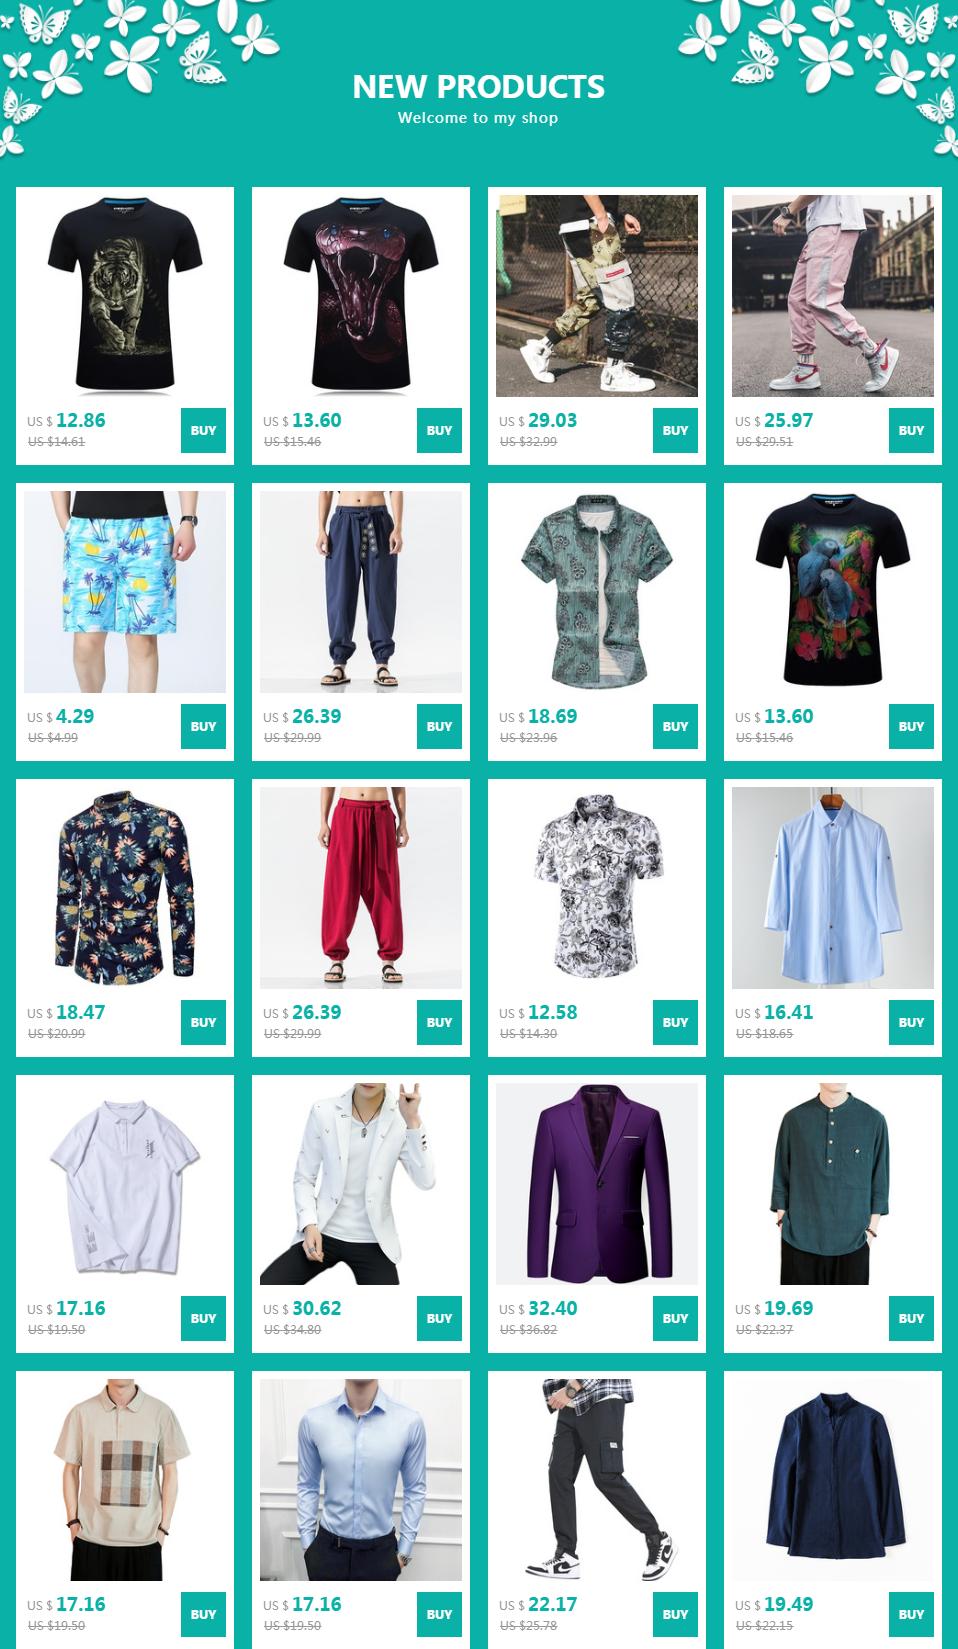 10 Patterns Camouflage Compression Shorts Men Summer Clothing Board Shorts Nylon Bottom Men Side Pockets Men's Swimwear 10